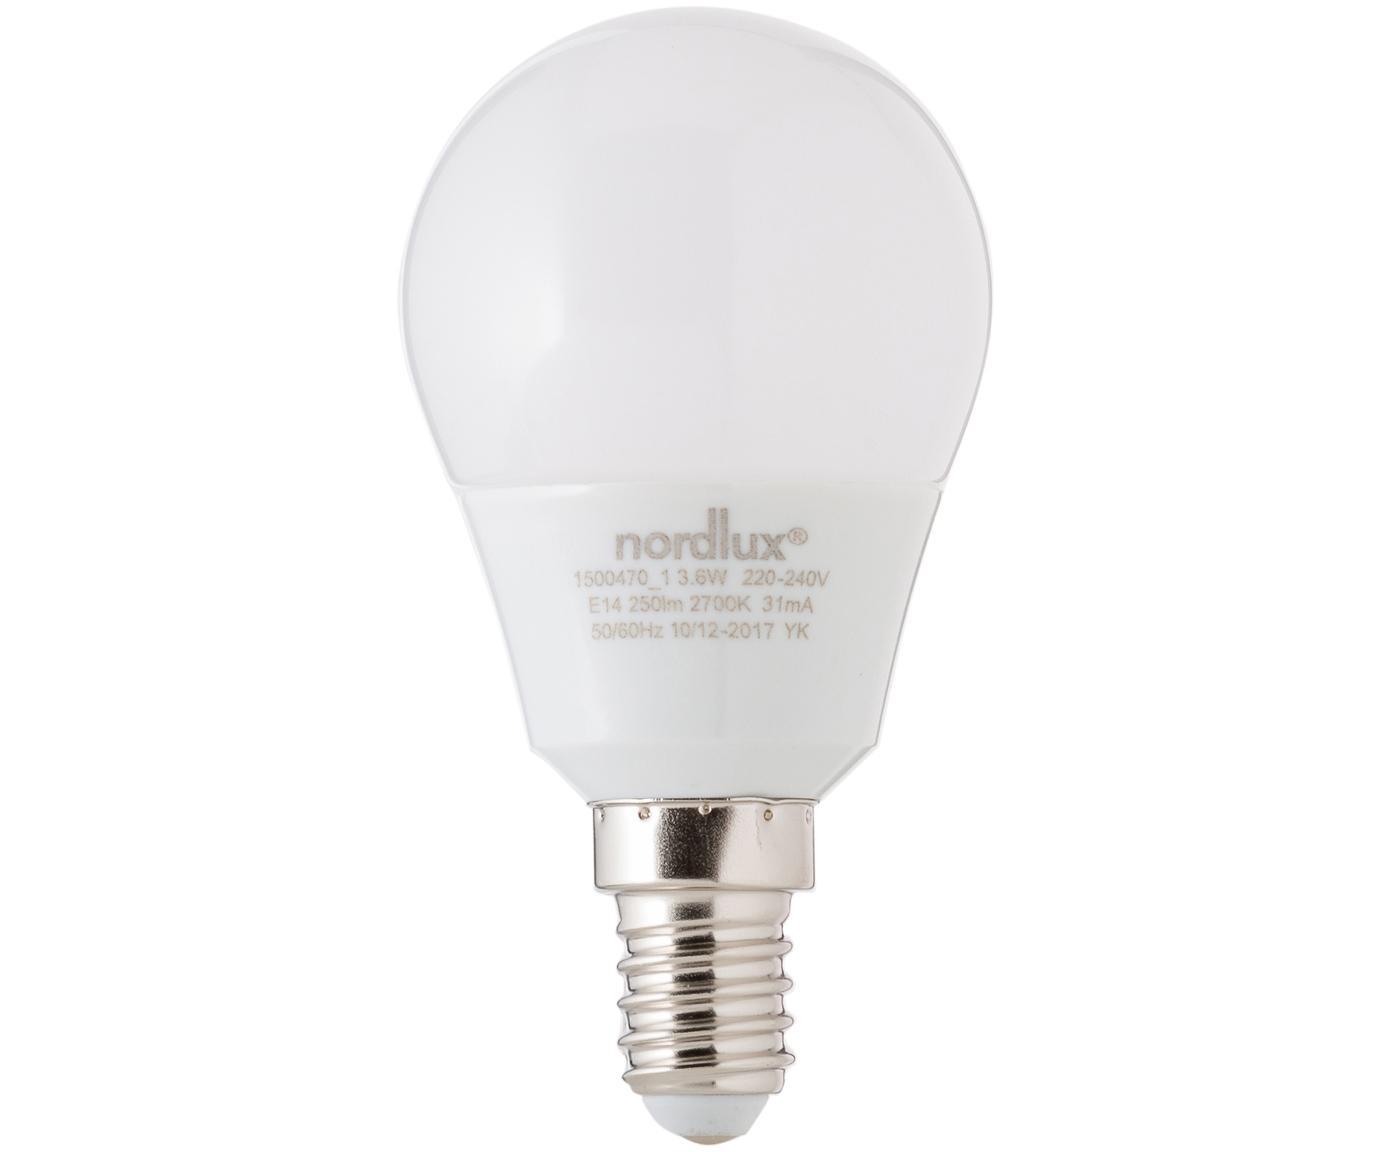 Lampadina a LED Azer (E14 / 3,5Watt) 5 pz, Paralume: vetro opale, Base lampadina: alluminio, Bianco, Ø 5 x Alt. 9 cm